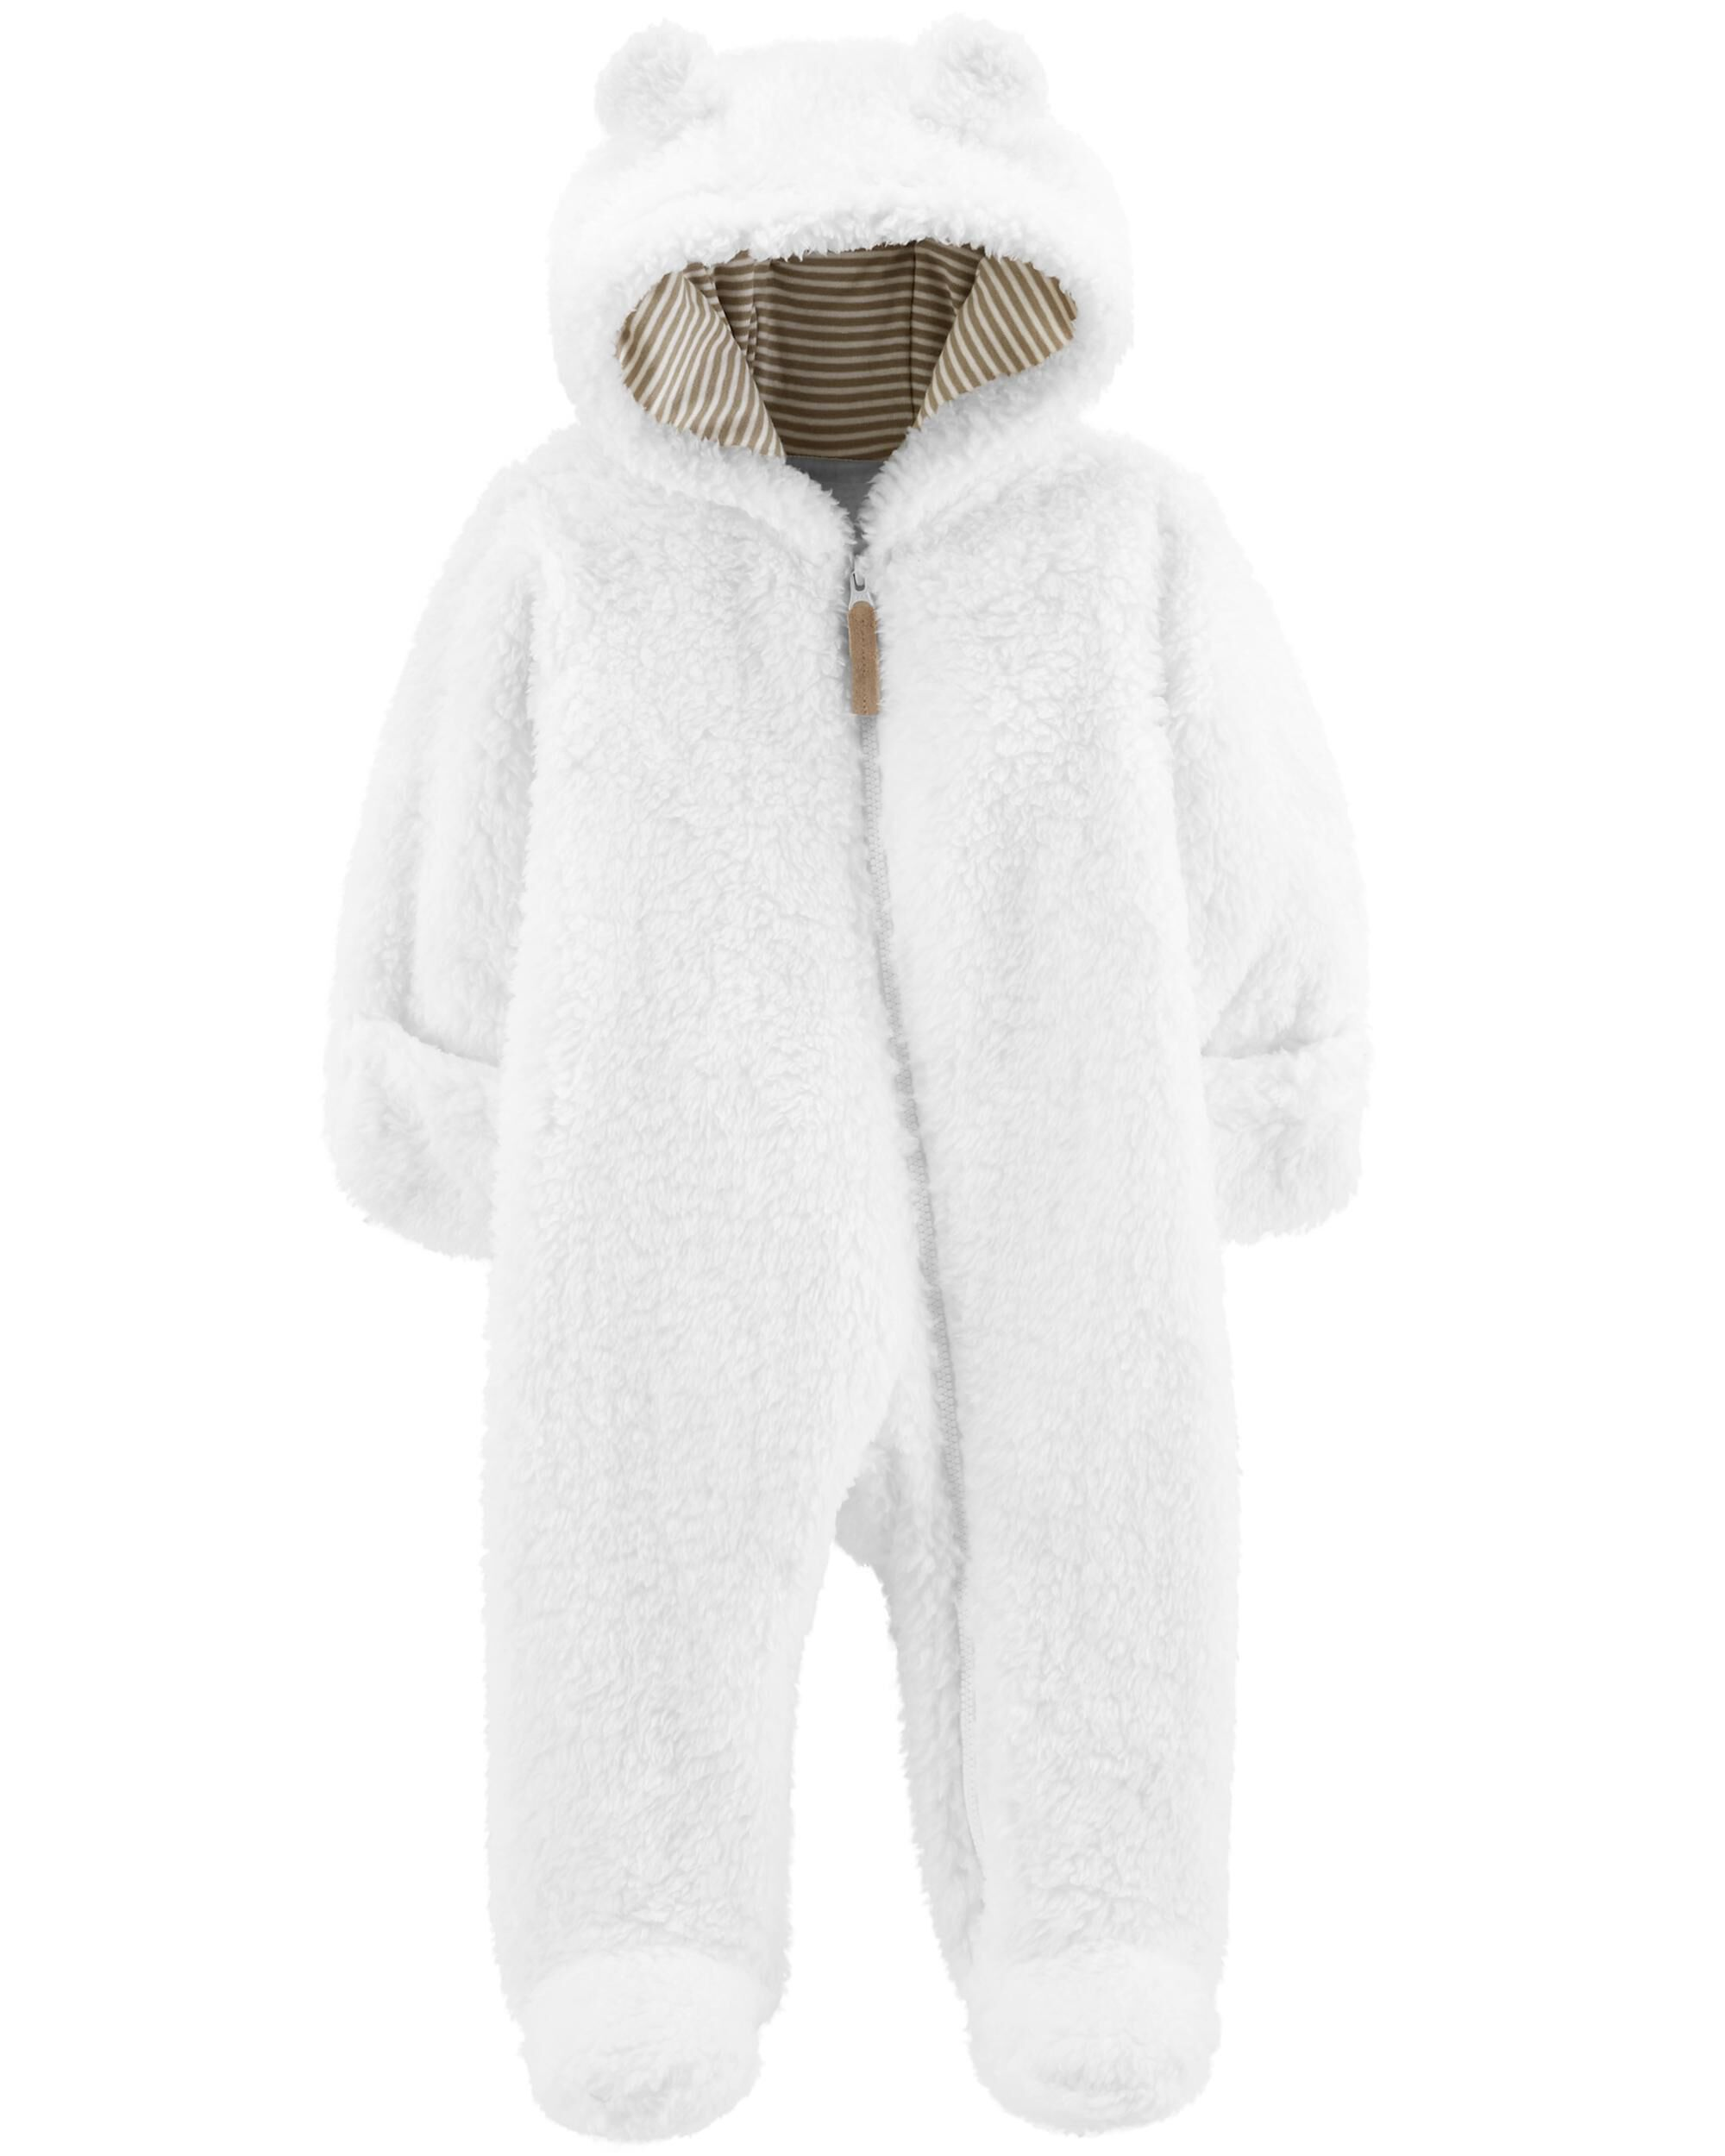 2ebbd8c7b Carters Baby Boys 3M-24M Hooded Sherpa Jacket Xmas